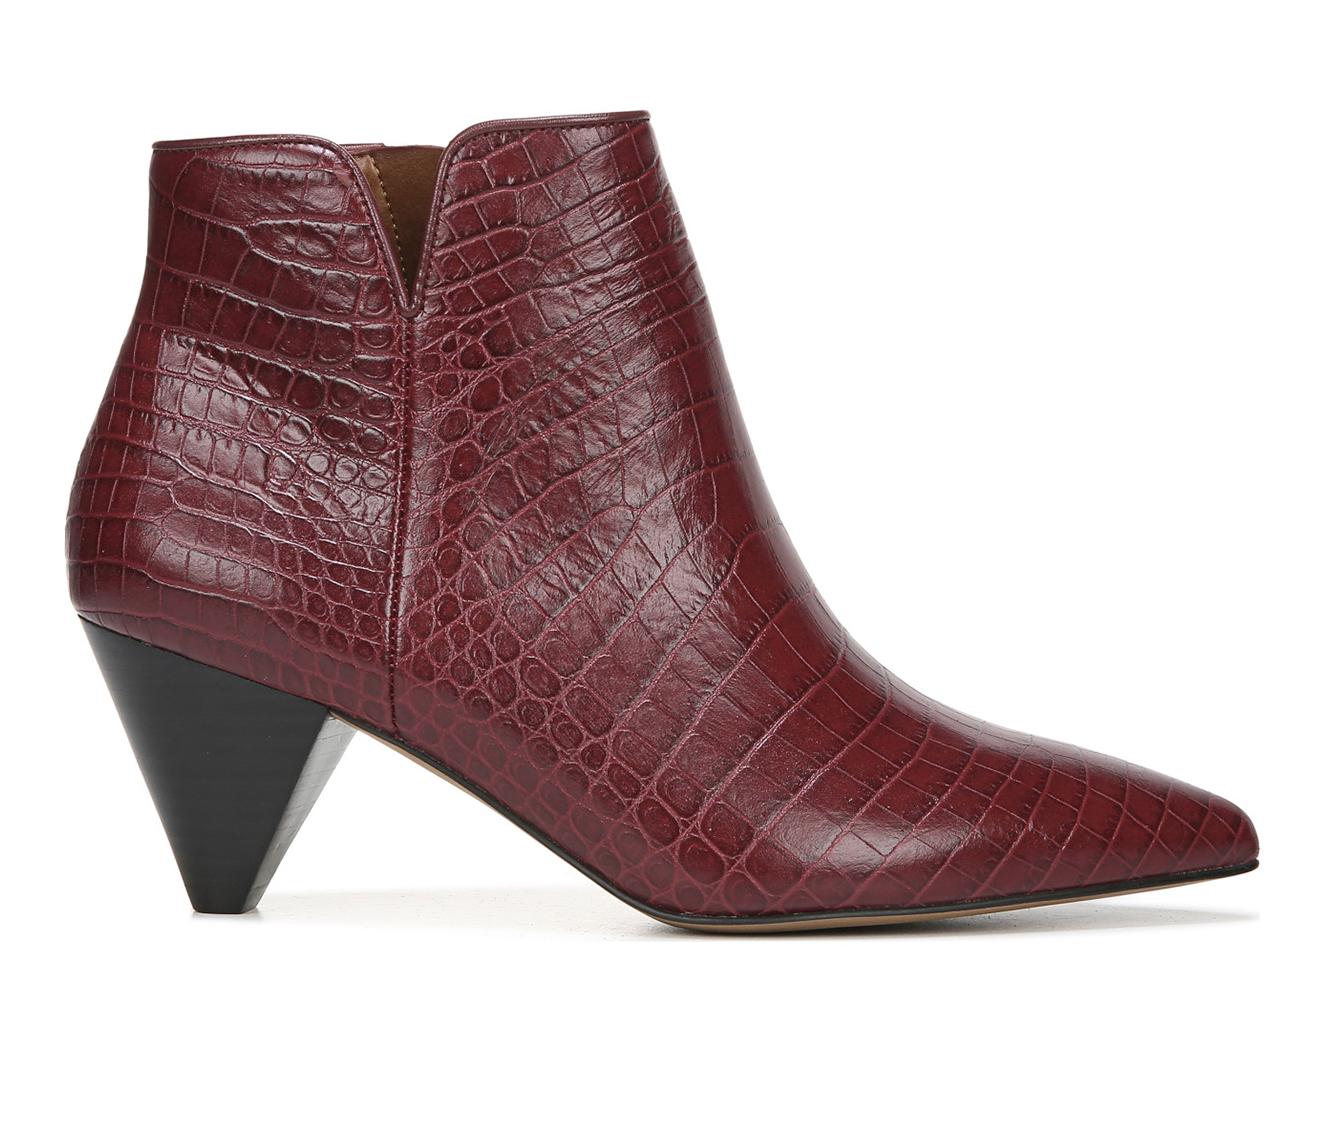 Franco Sarto Dare 2 Women's Boots (Red - Leather)